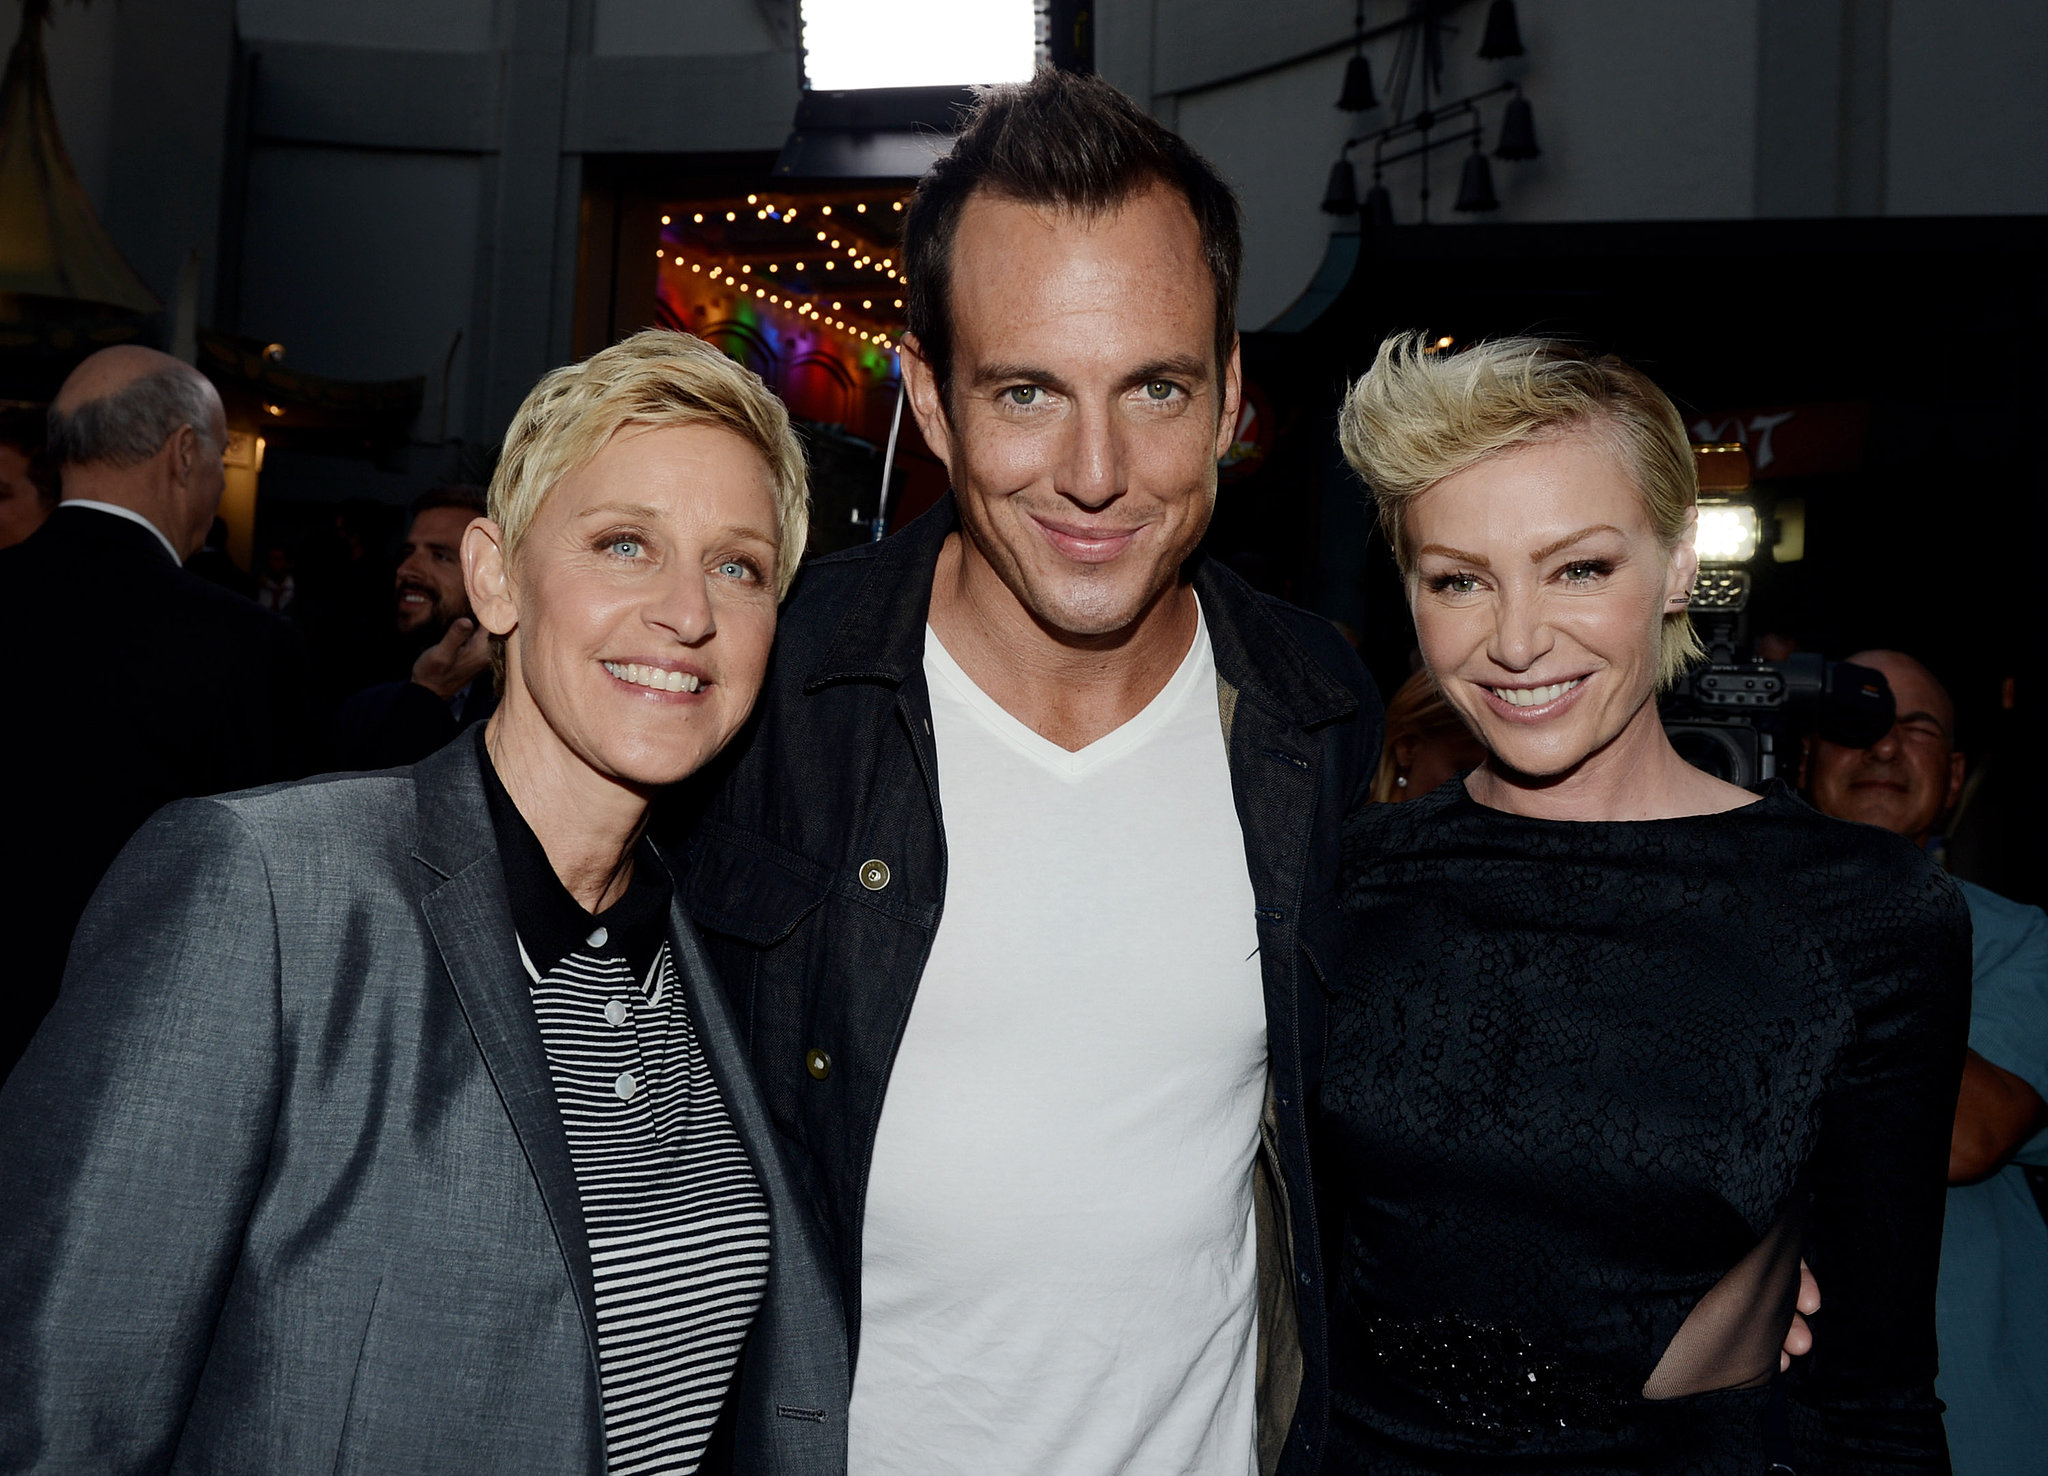 Will Arnett hugged Ellen DeGeneres and Portia de Rossi at the premiere.